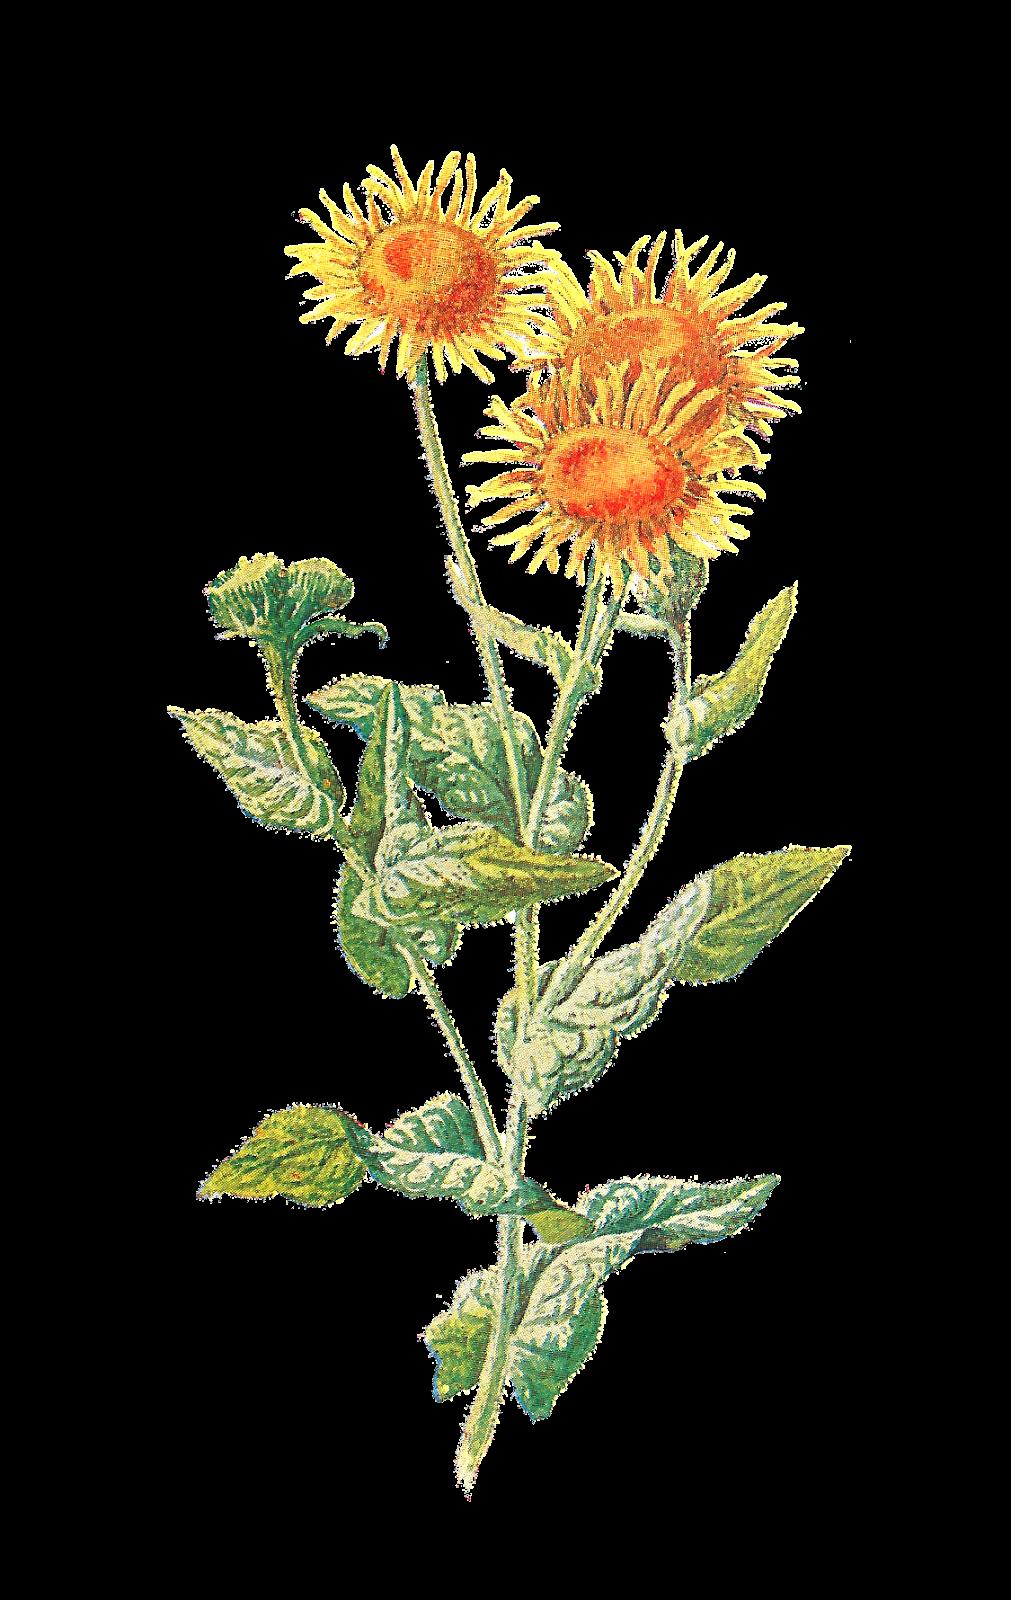 Wildflower clipart yellow flower Flower of sounding like Digital